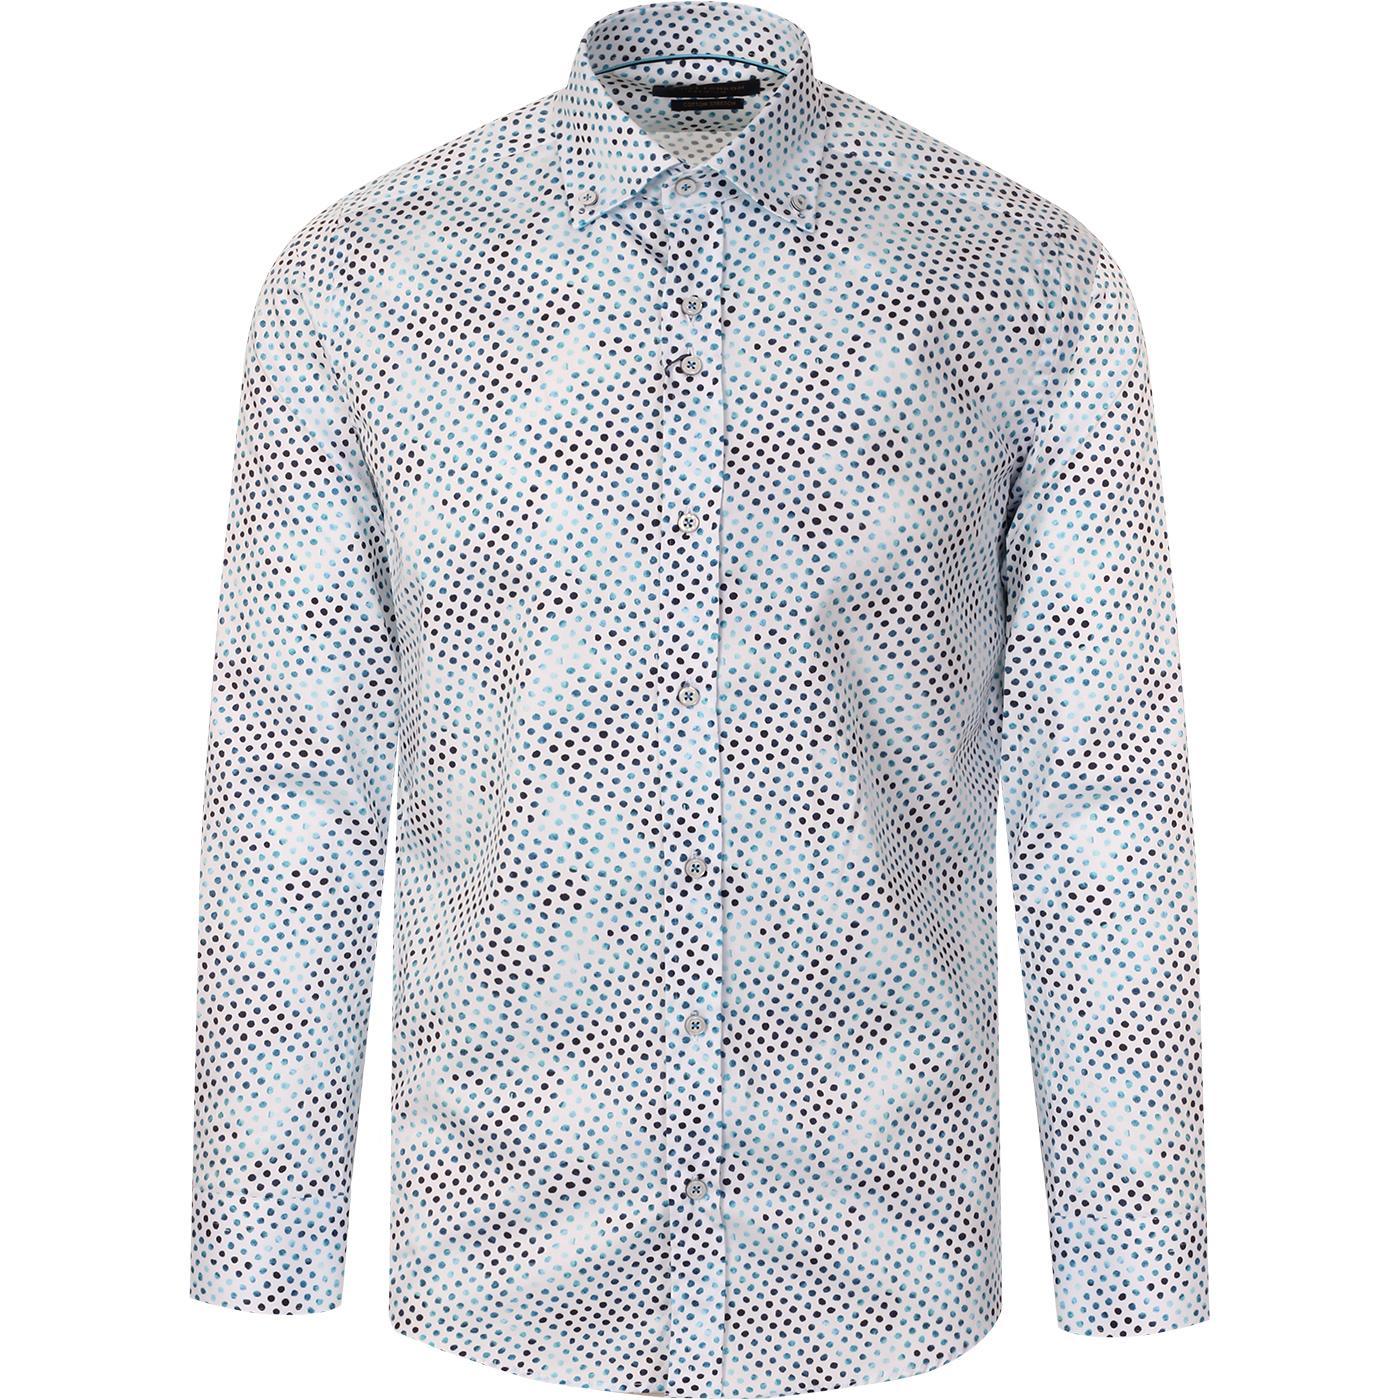 GUIDE LONDON Smudgy Polka Dot 60s Mod Shirt